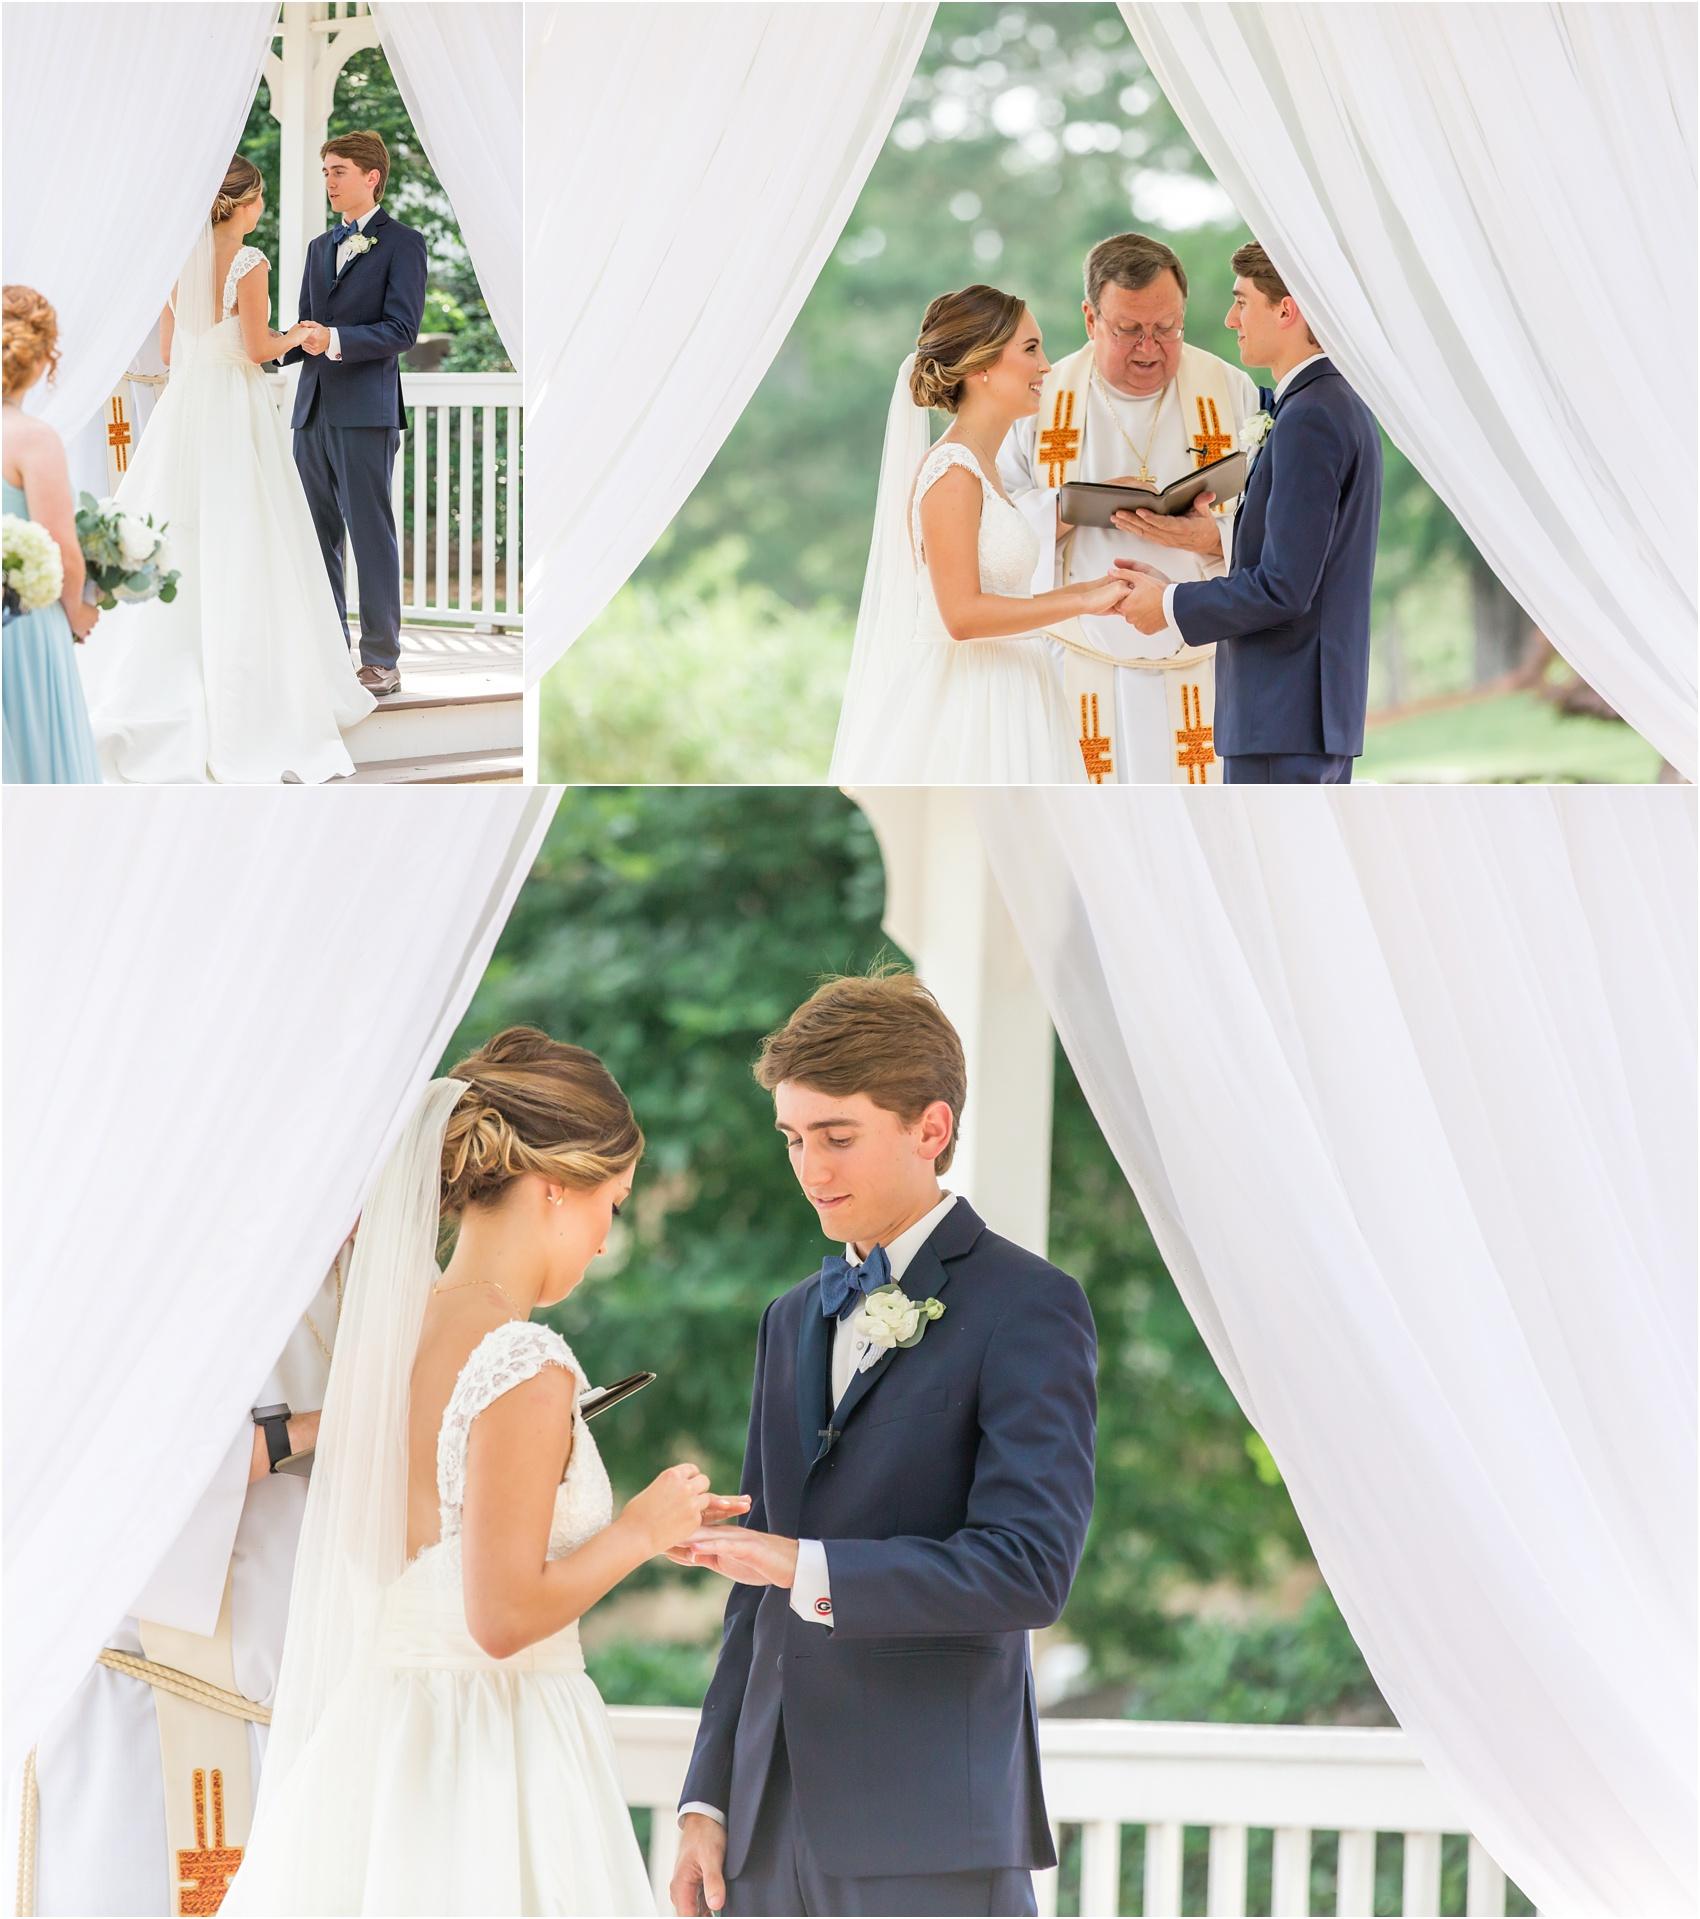 Savannah Eve Photography- Sigl-Adams Wedding- Sneak Peek-36.jpg